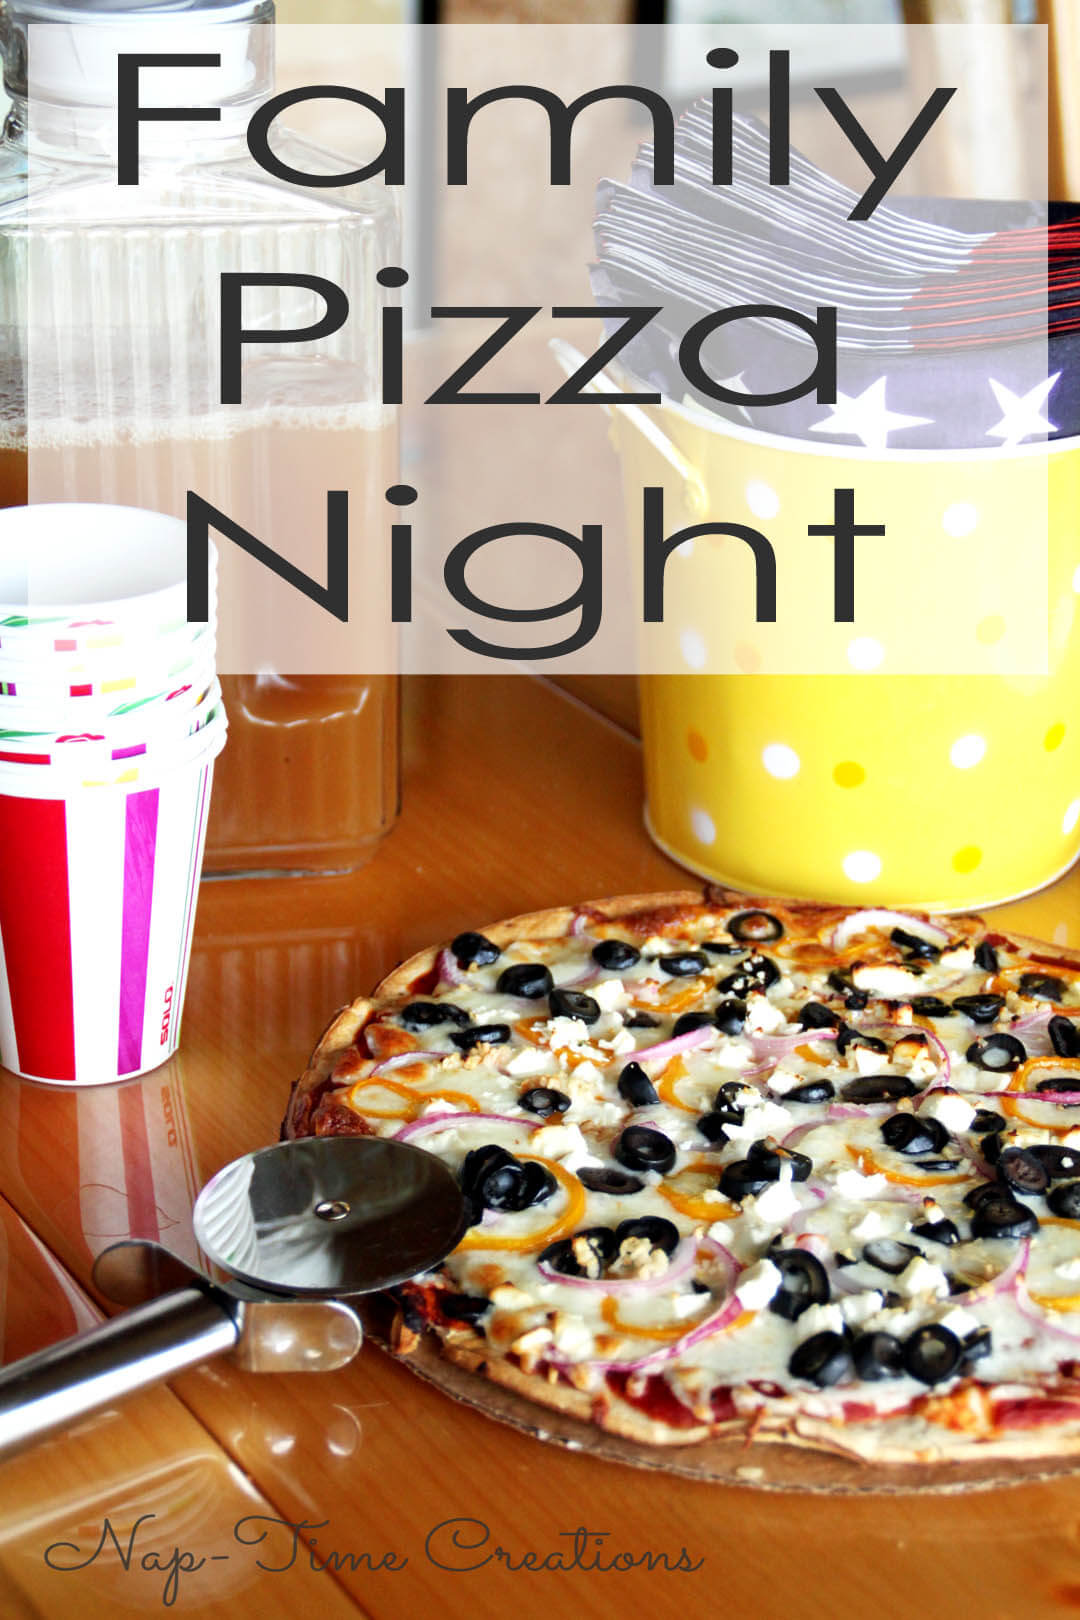 Family Pizza Night Life Sew Savory